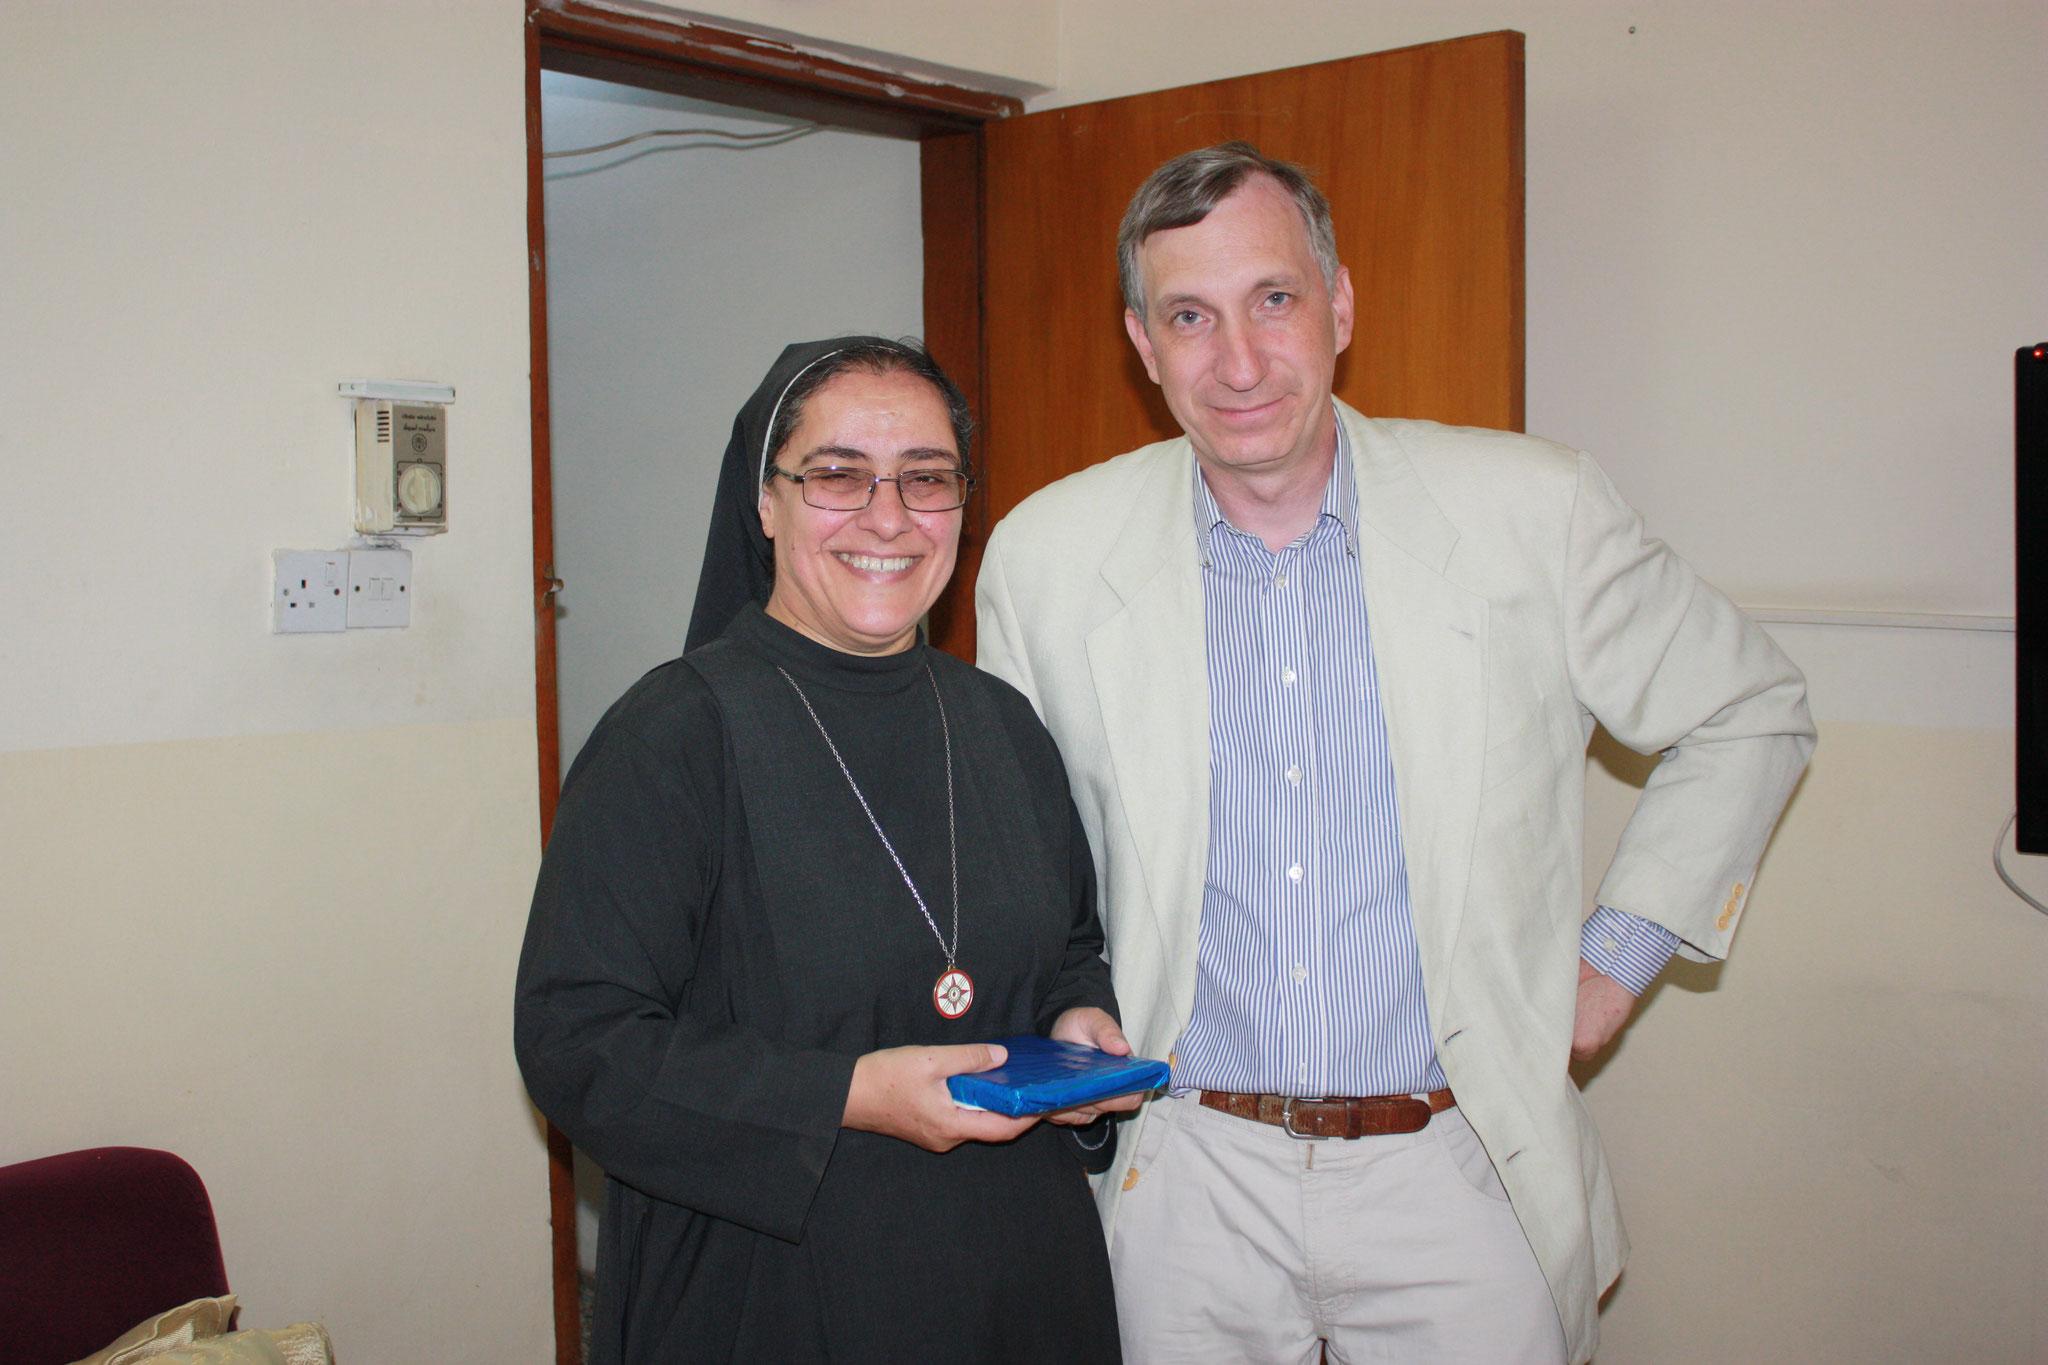 ICO-Projektkoordinator Stefan Maier (re) mit Sr. Sanna Hanna Oberin der Screat Heart of Jesus Schwestern